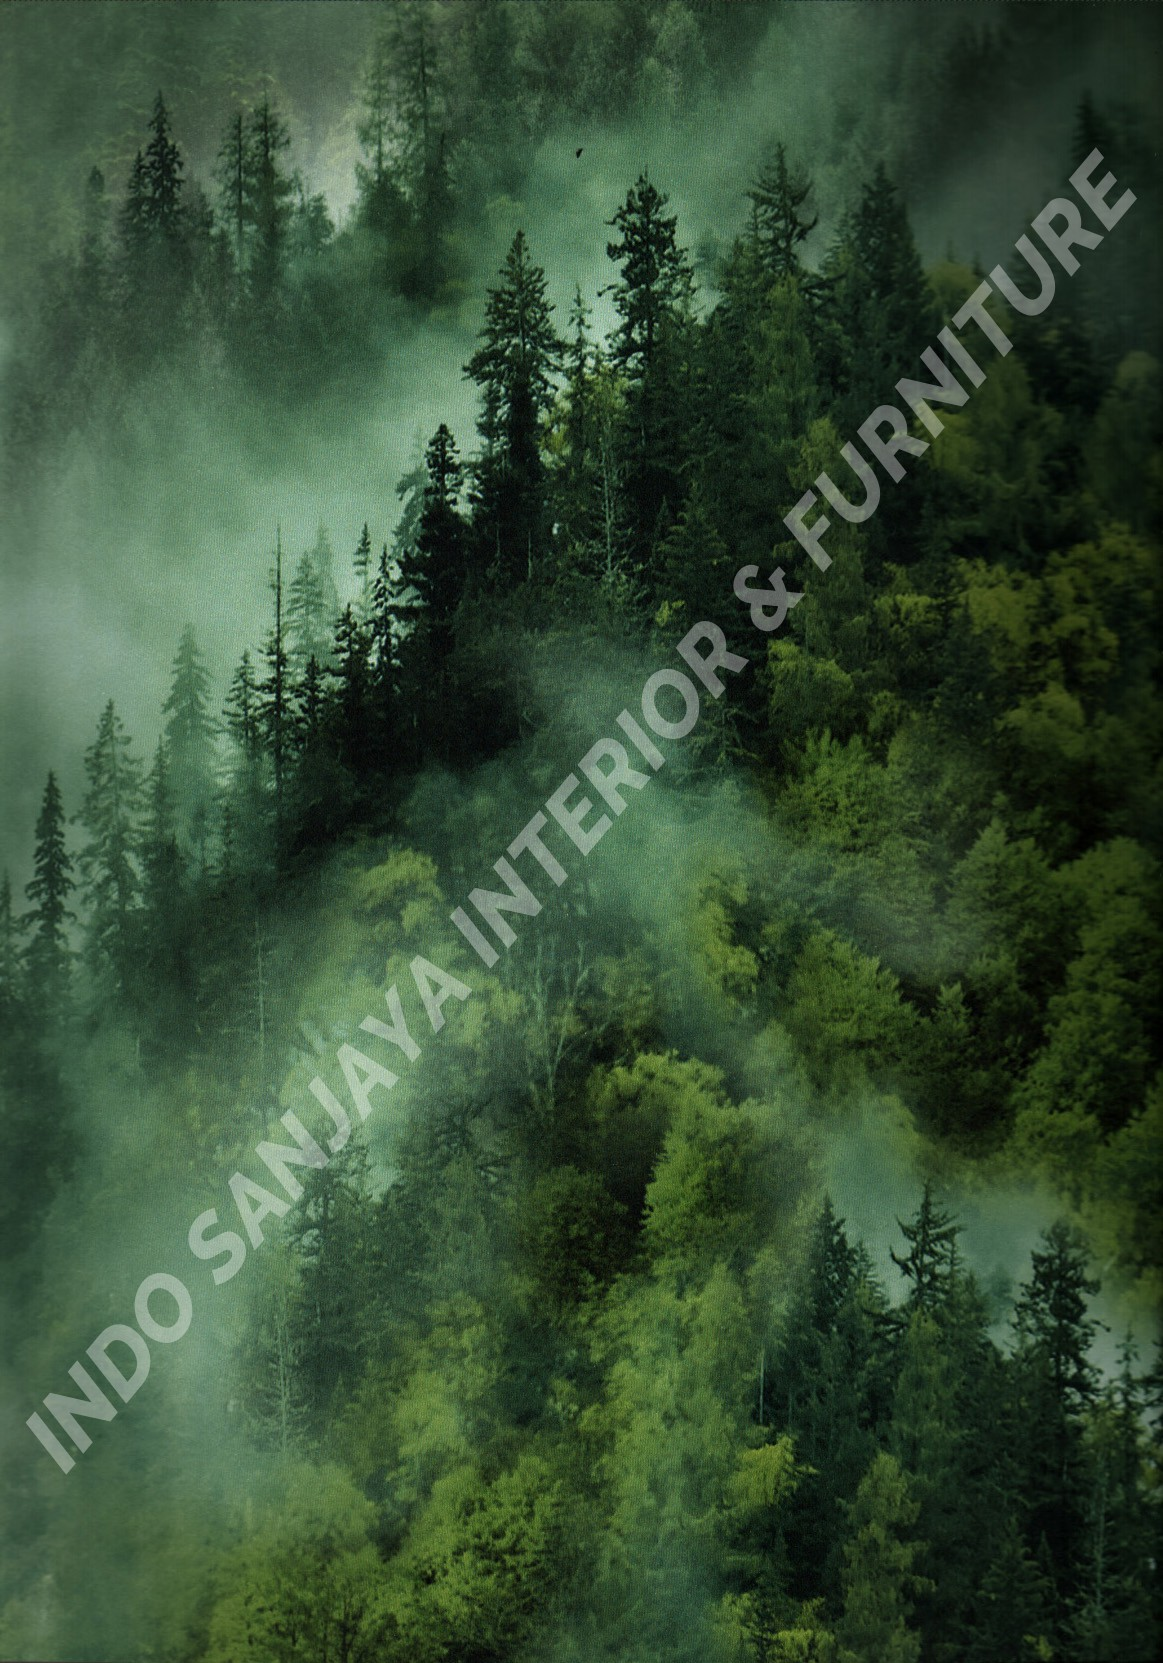 wallpaper ASSEMBLE:40113-1 corak Daun - Daunan warna Hijau